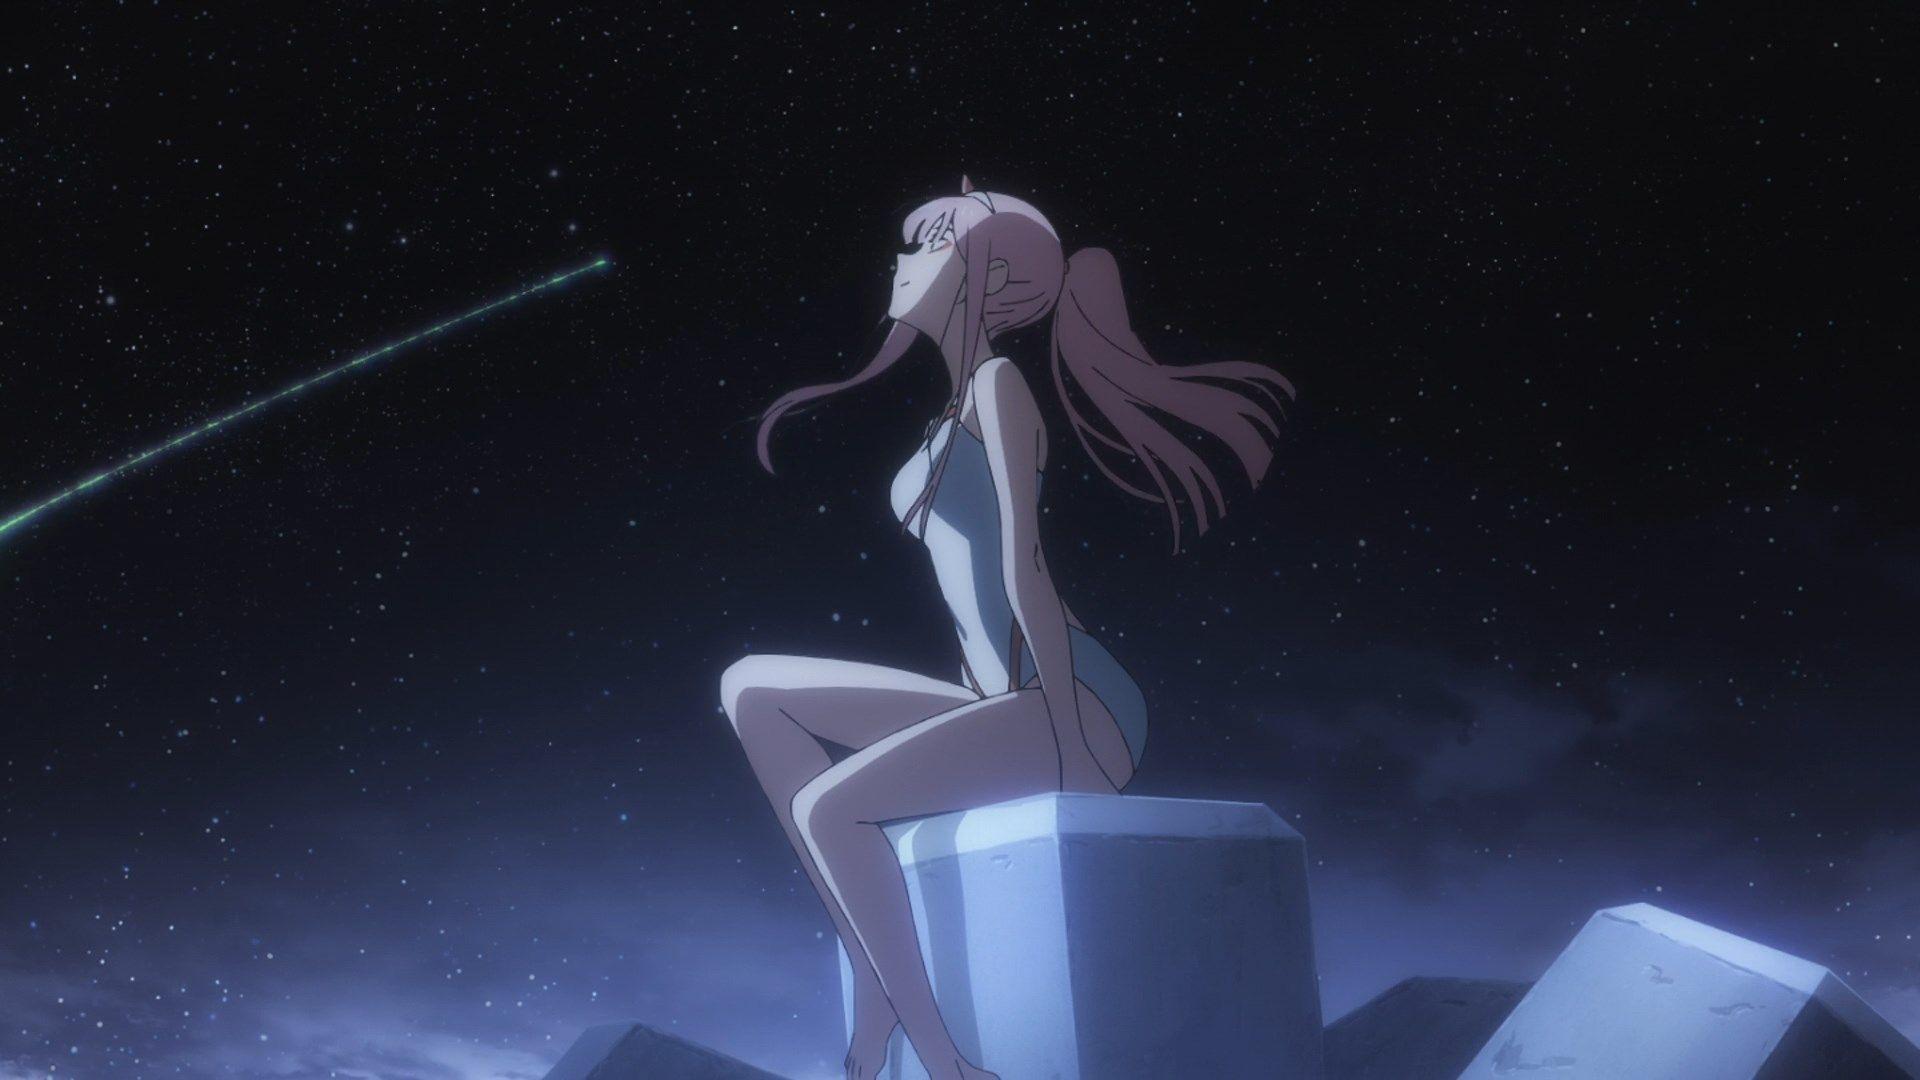 Zero Two Starry Sky Beach Darling In The Franxx Darling In The Franxx Wallpaper Pc Anime Zero Two